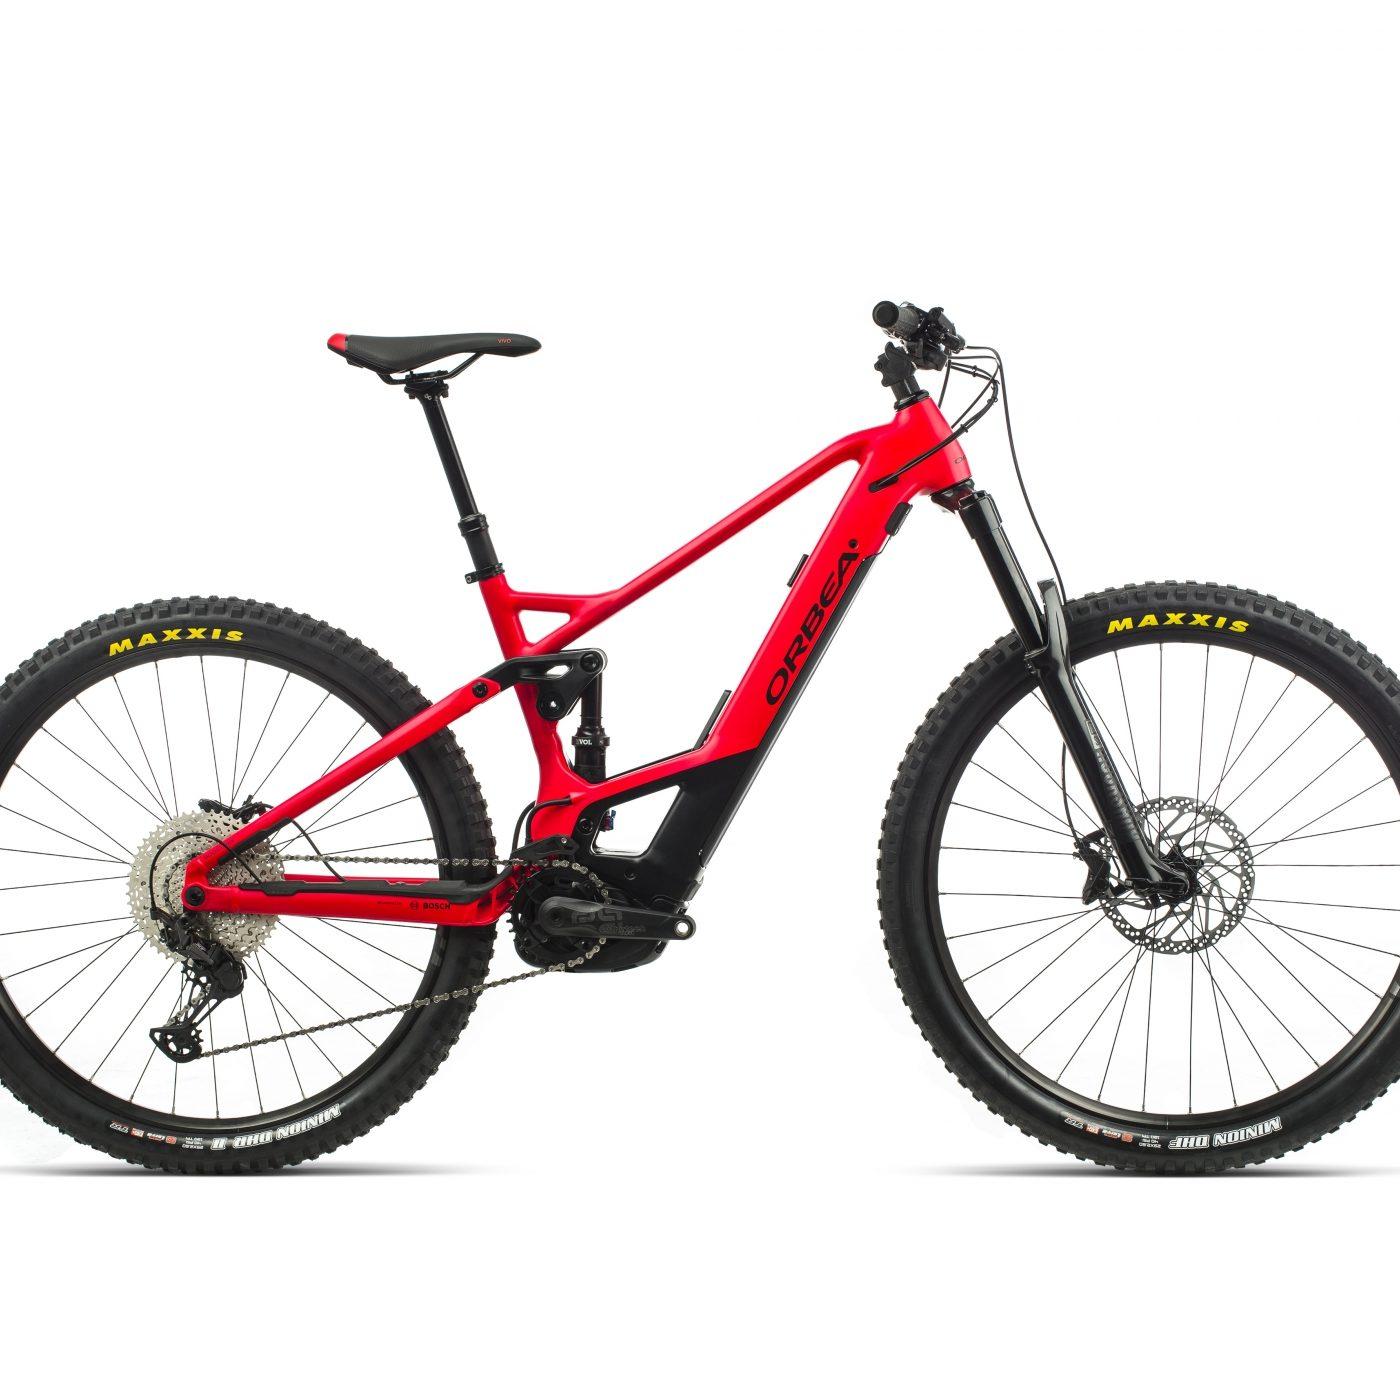 ORBEA WILD FS H30 eBike - BRIGHTRED /ZWART (DOF) @G-Bikes